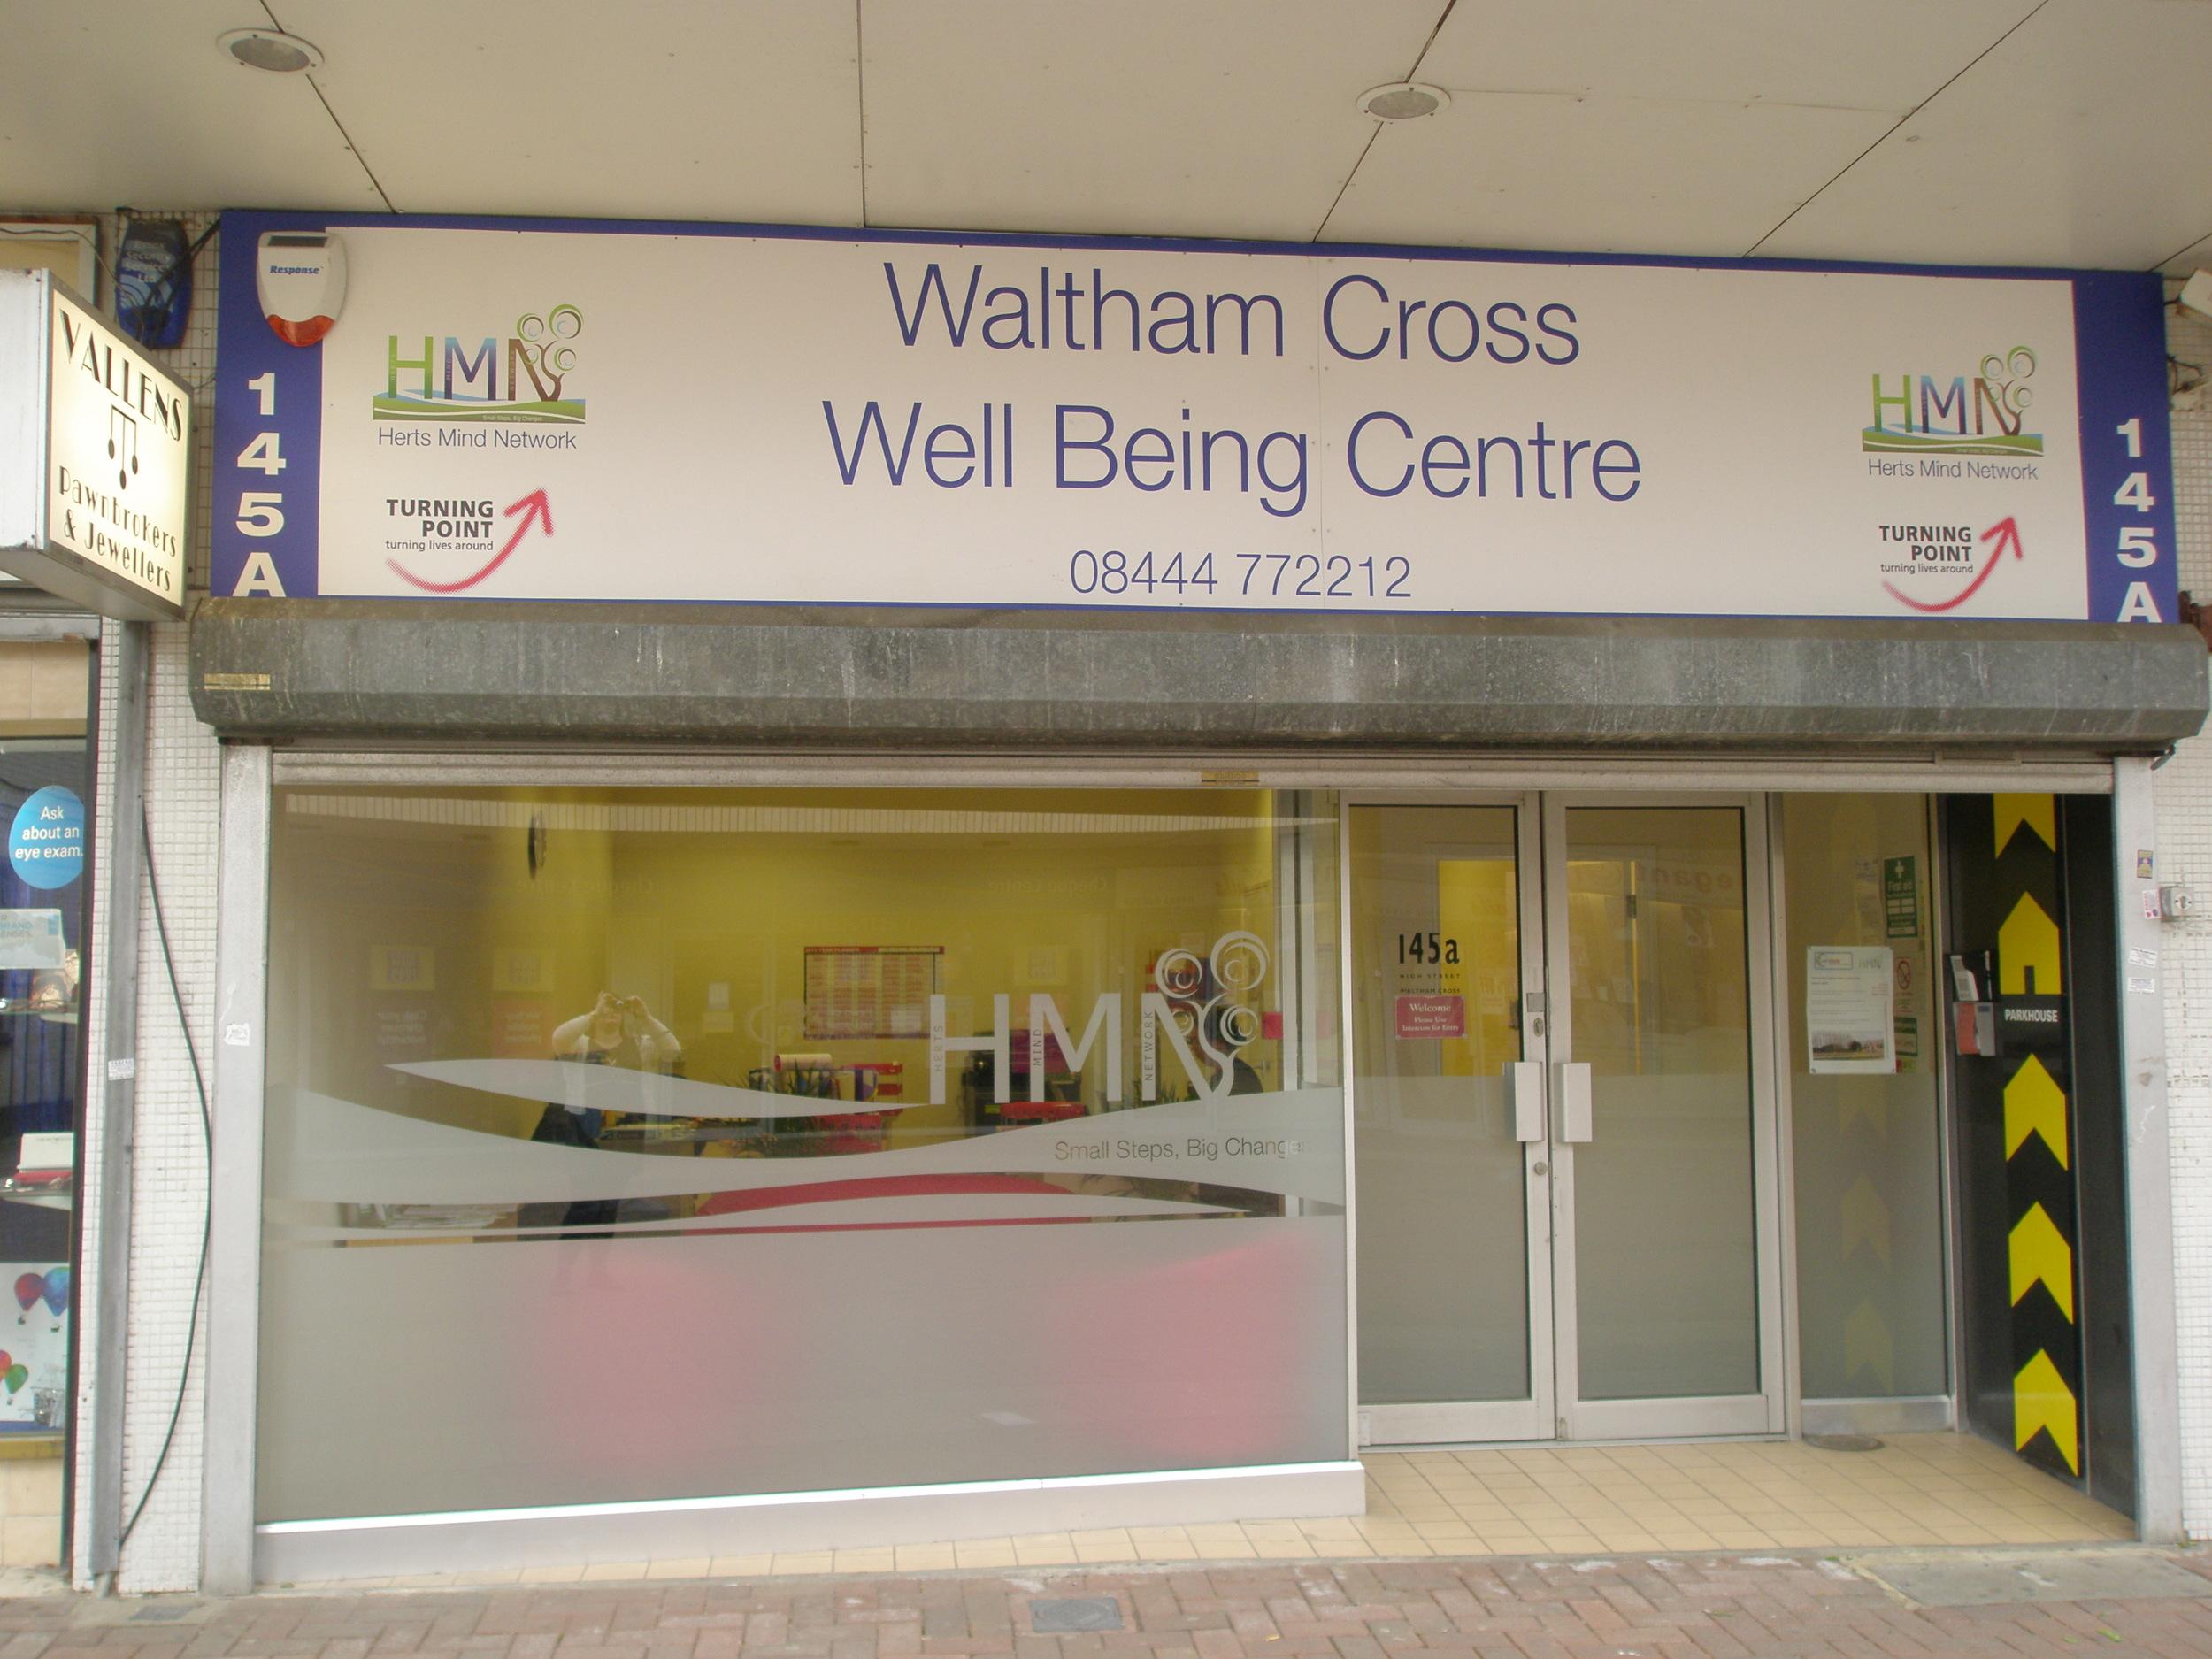 HMN Wellbeing Centre WX.JPG